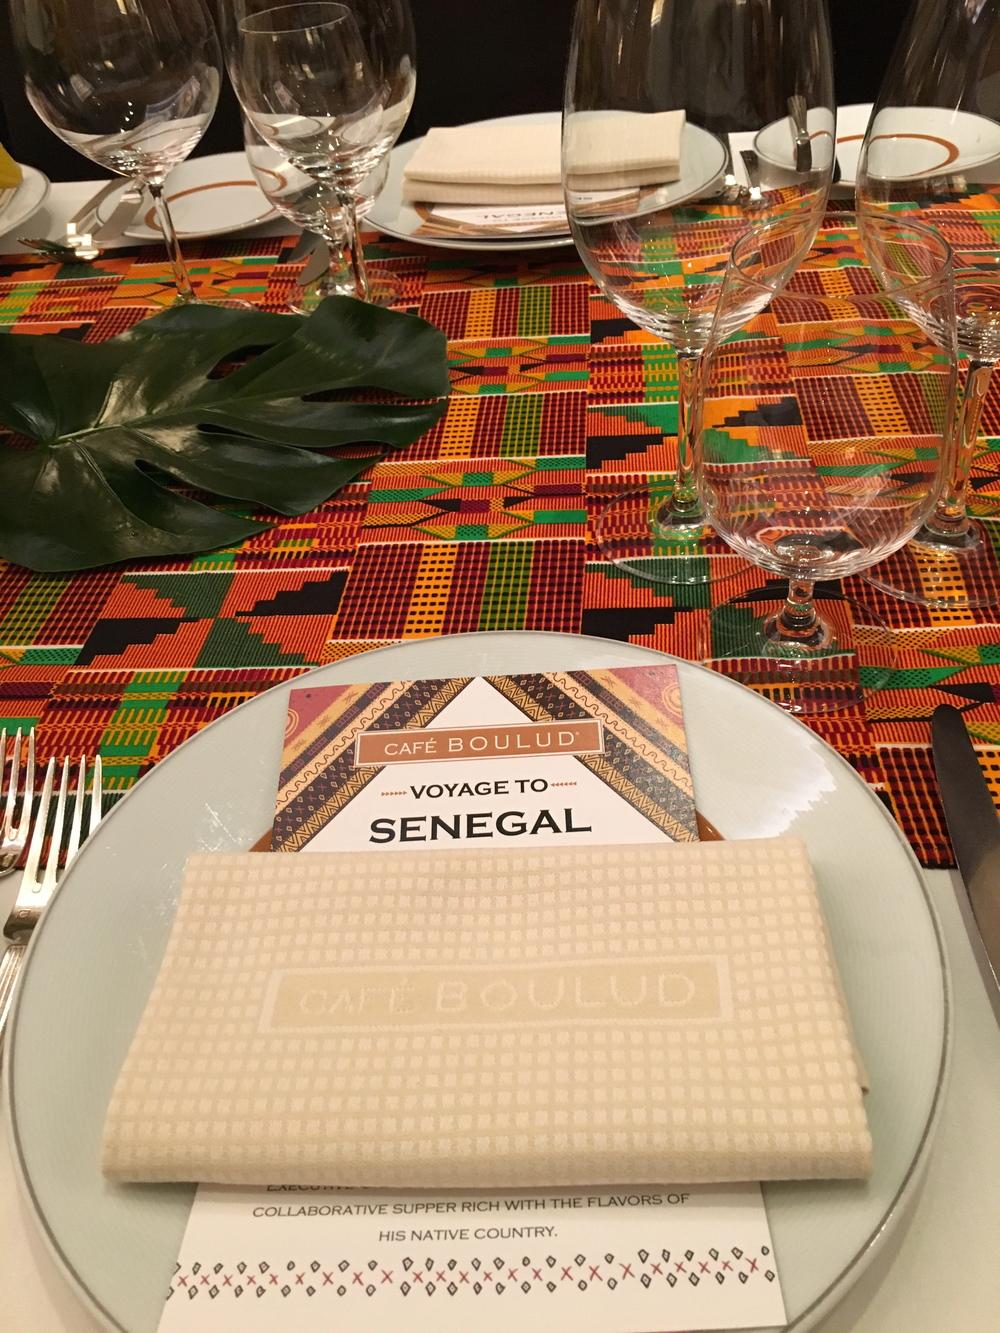 Senegal menu Cafe Boulud